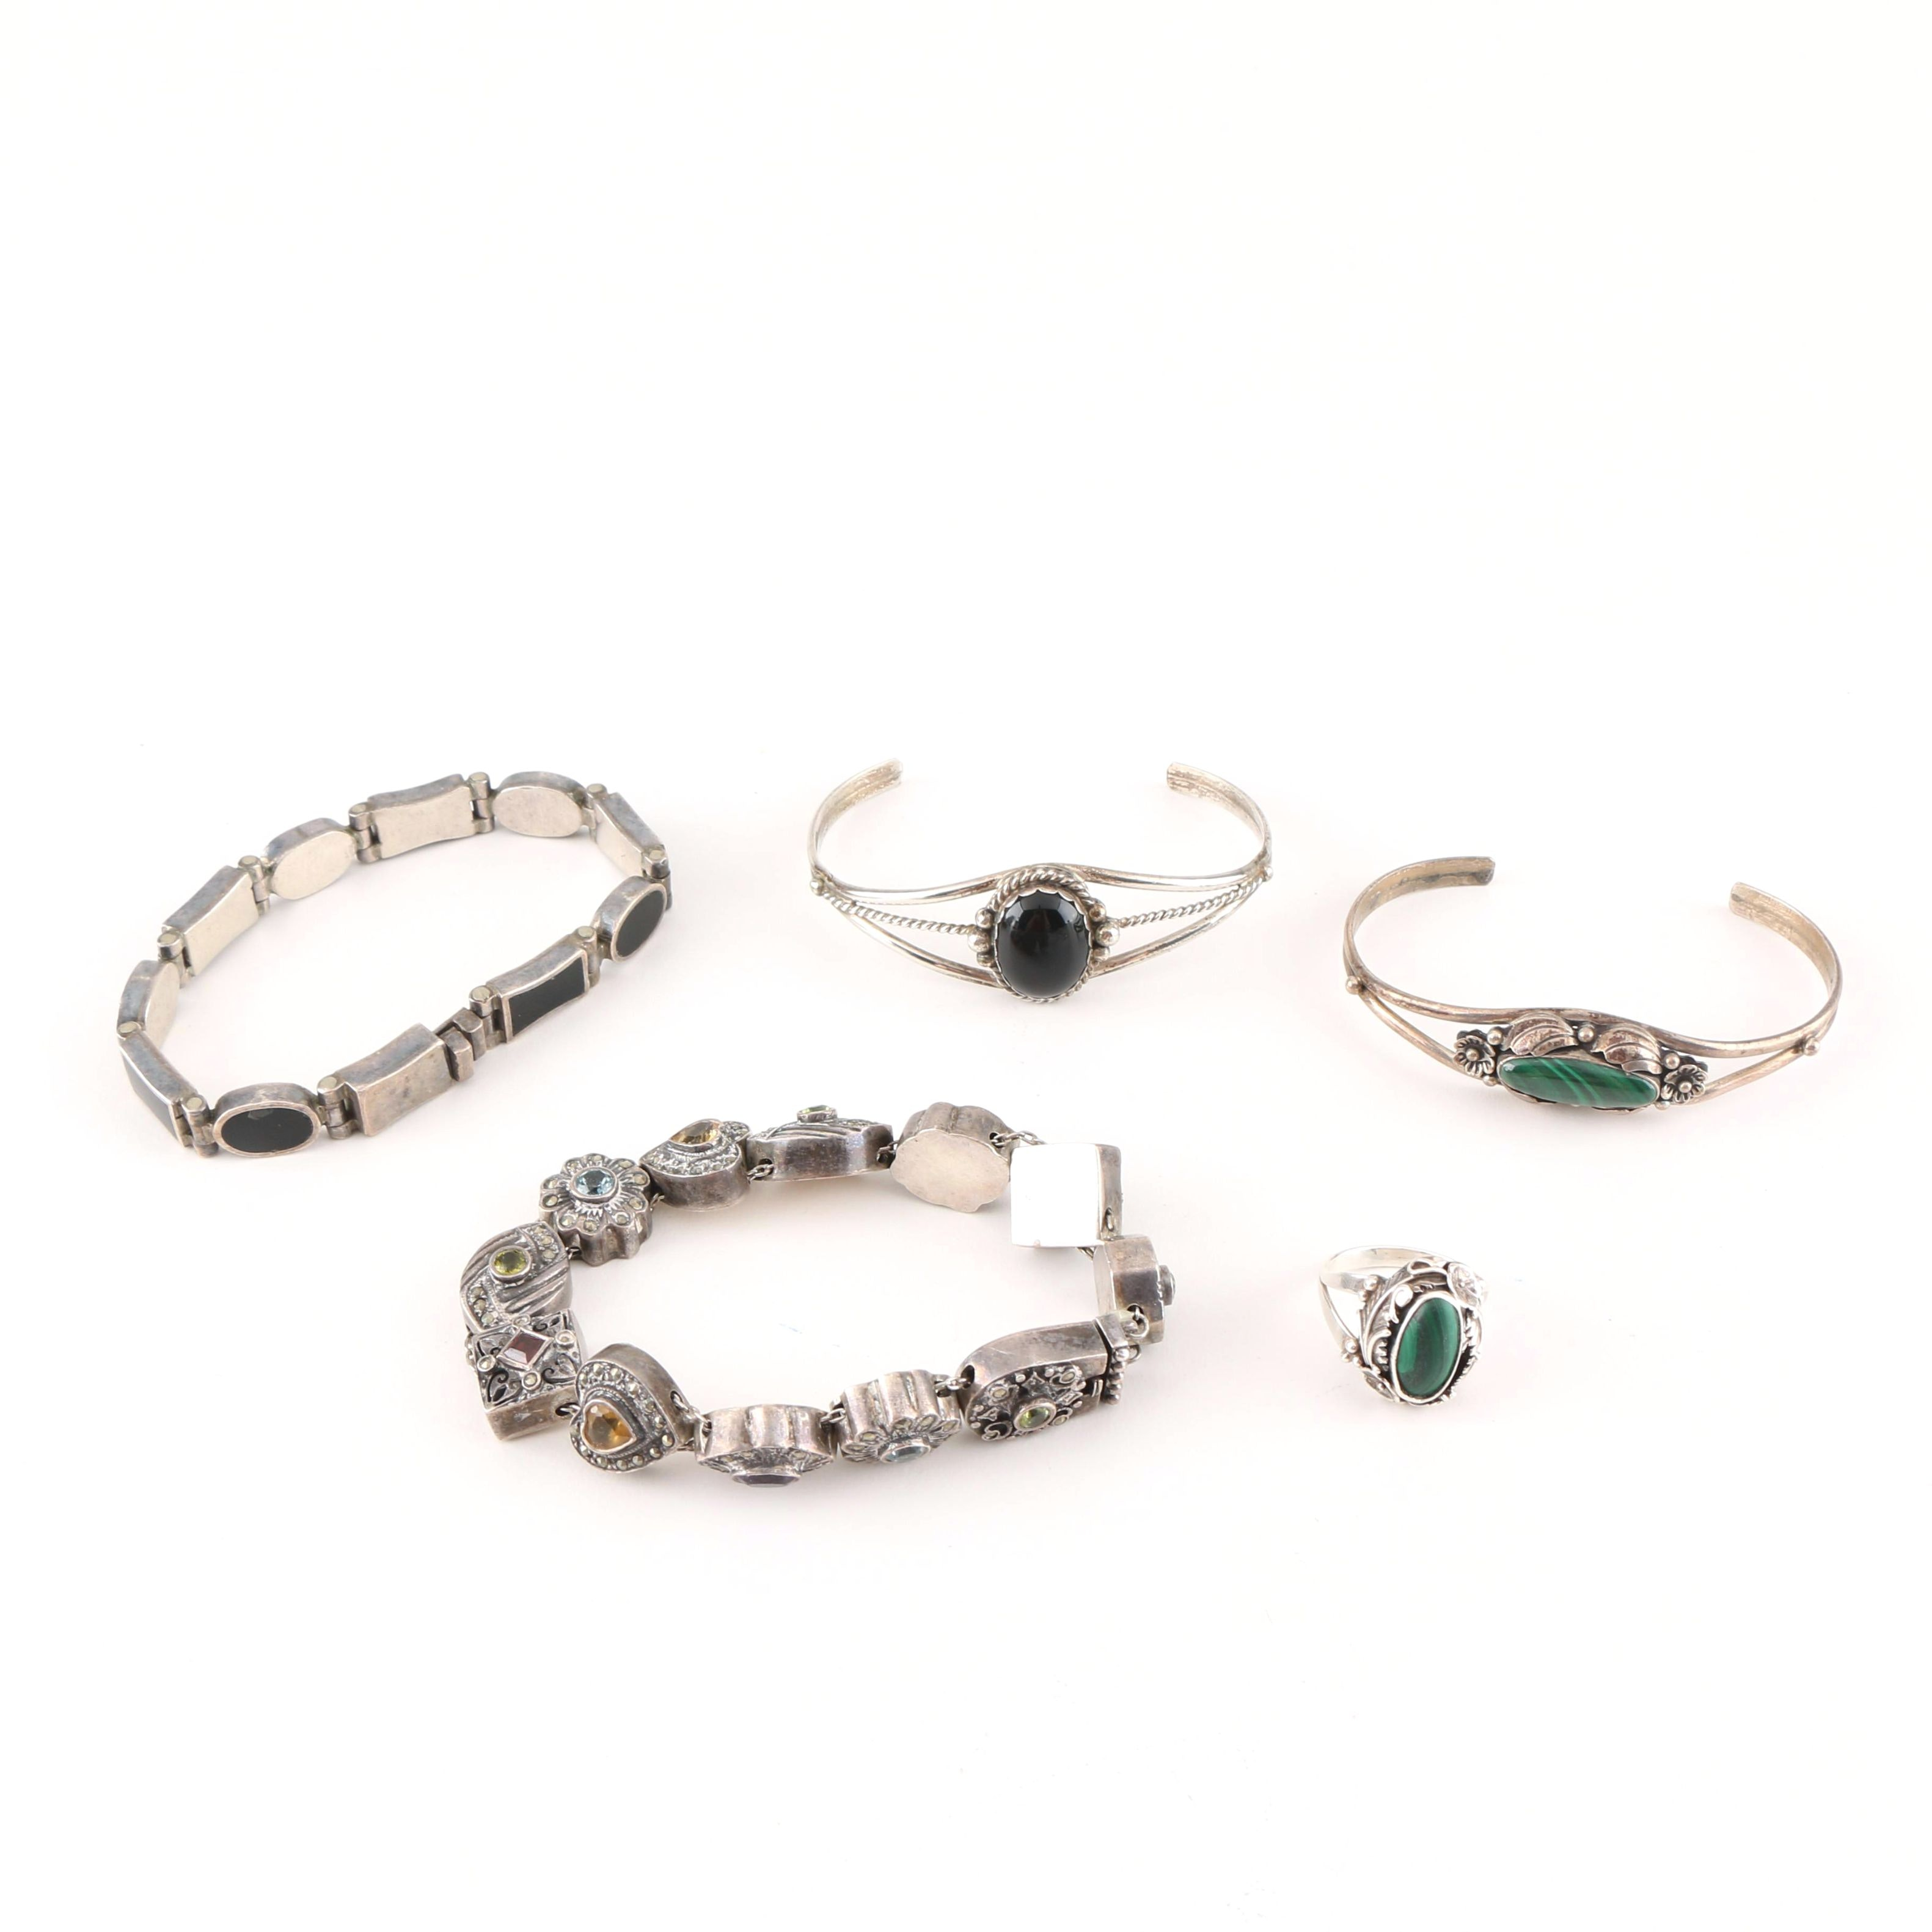 Vintage Sterling Silver Bracelets and Raymond Gasper Zuni Ring